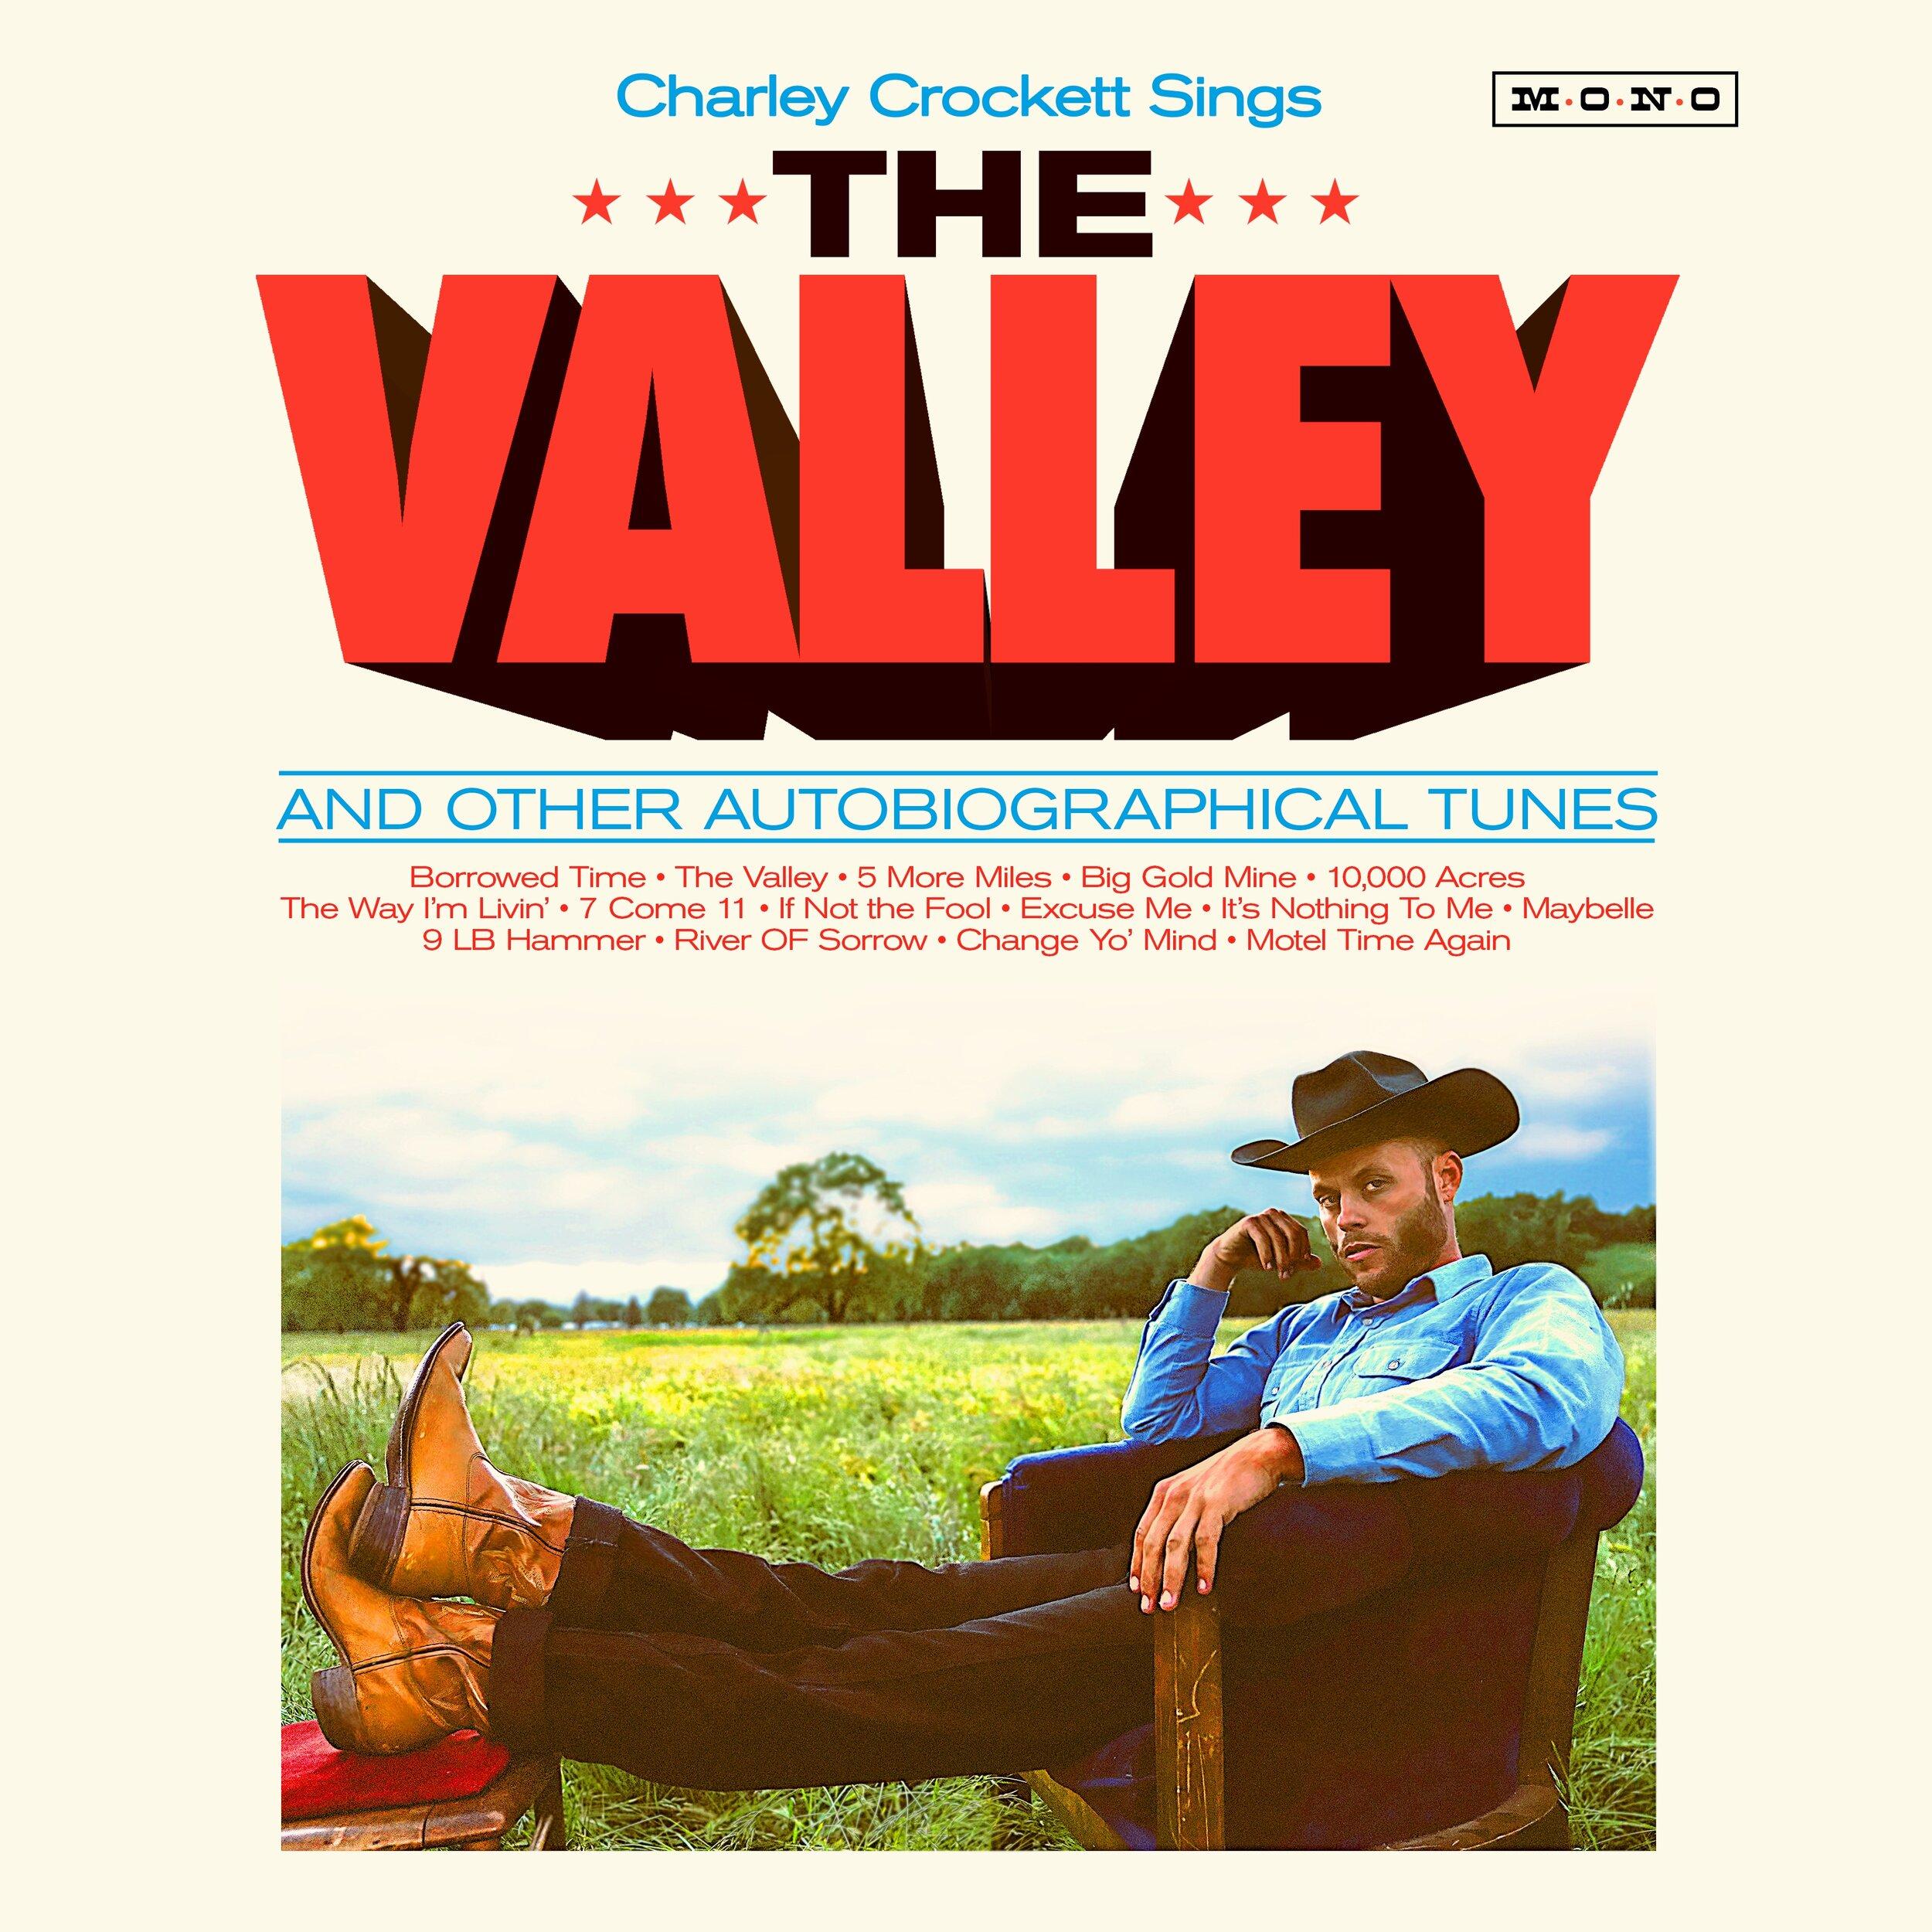 Charley Crockett - The Valley COVER 3600x3600.jpg